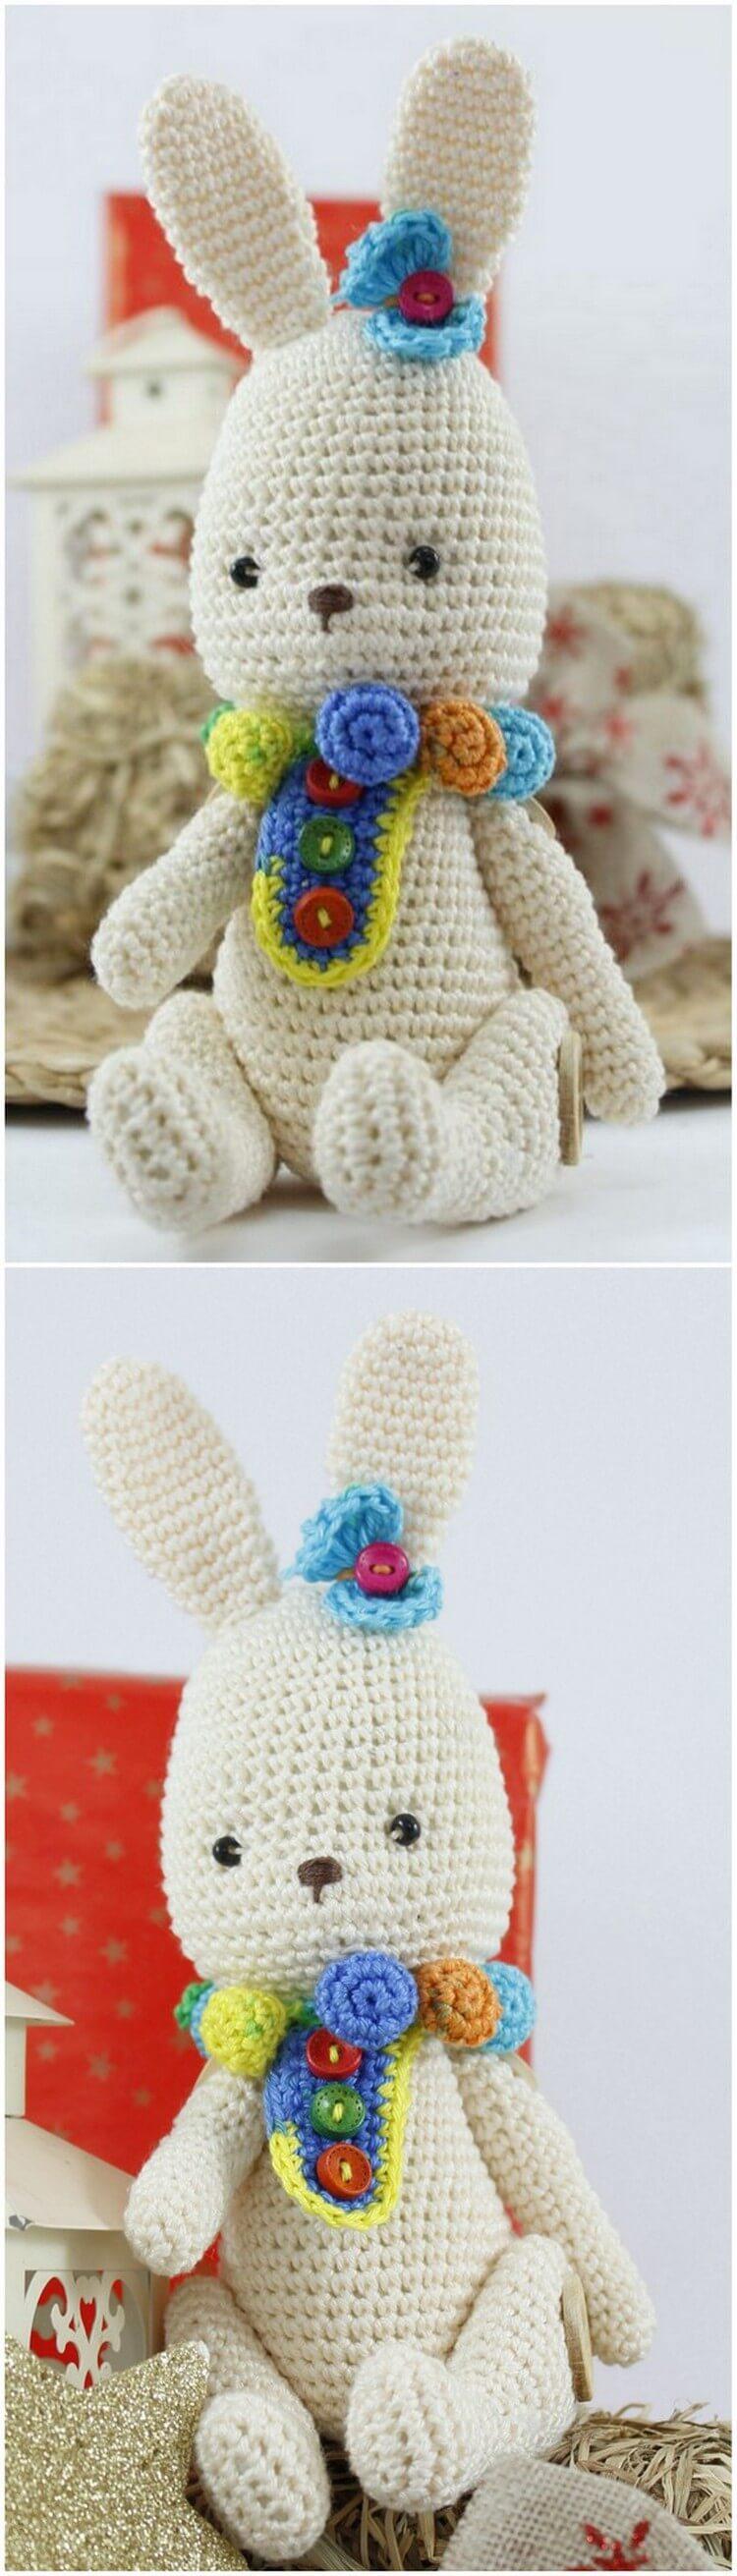 Crochet Amigurumi Pattern (91)